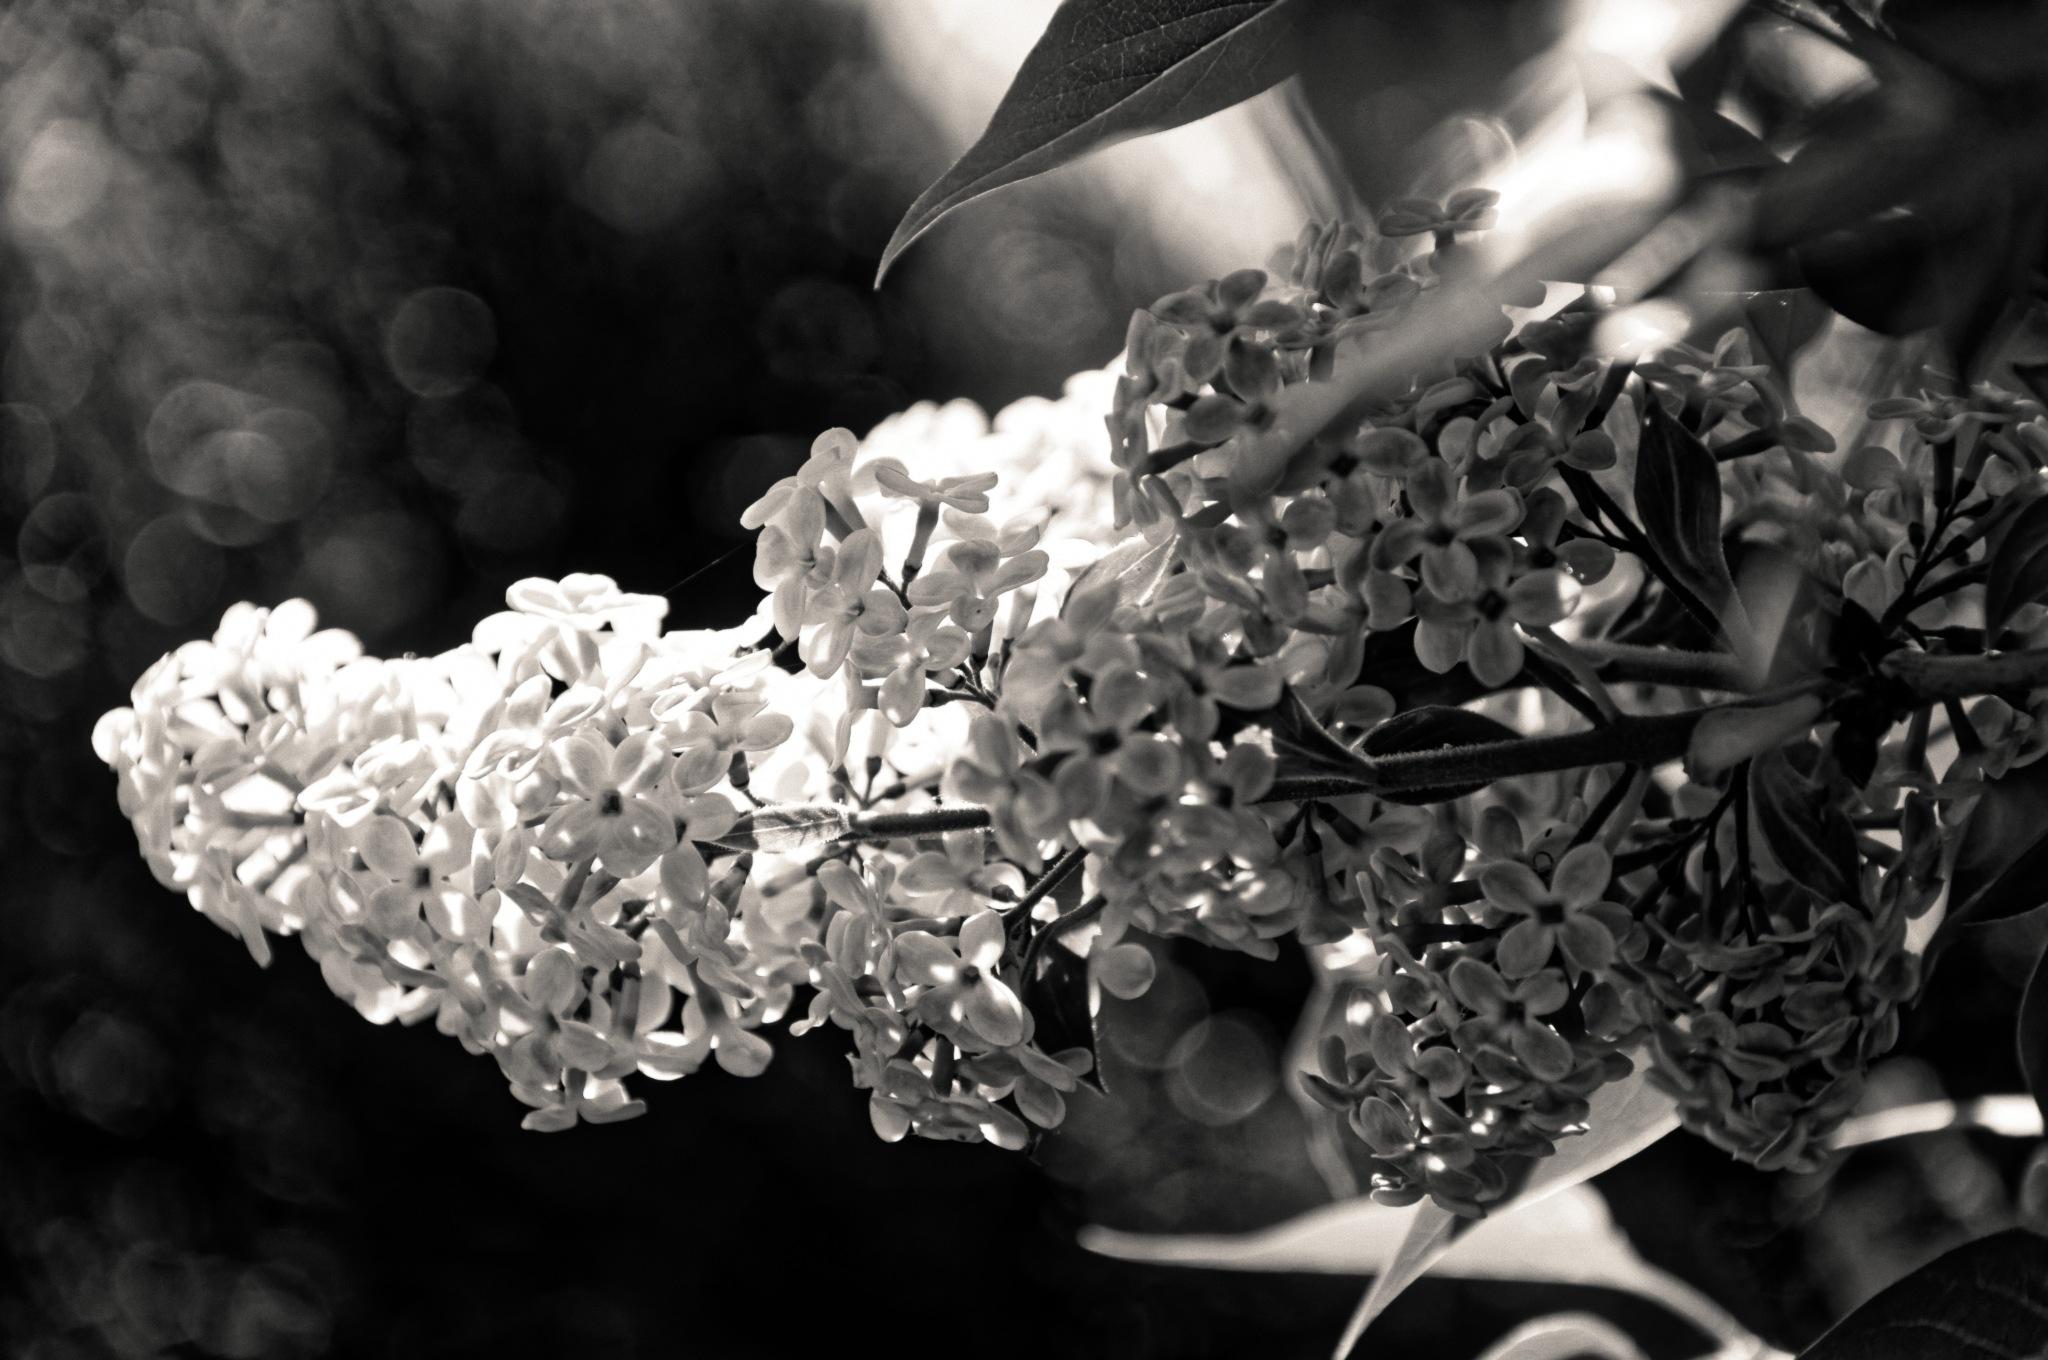 B&W Blossom by Nik Phot